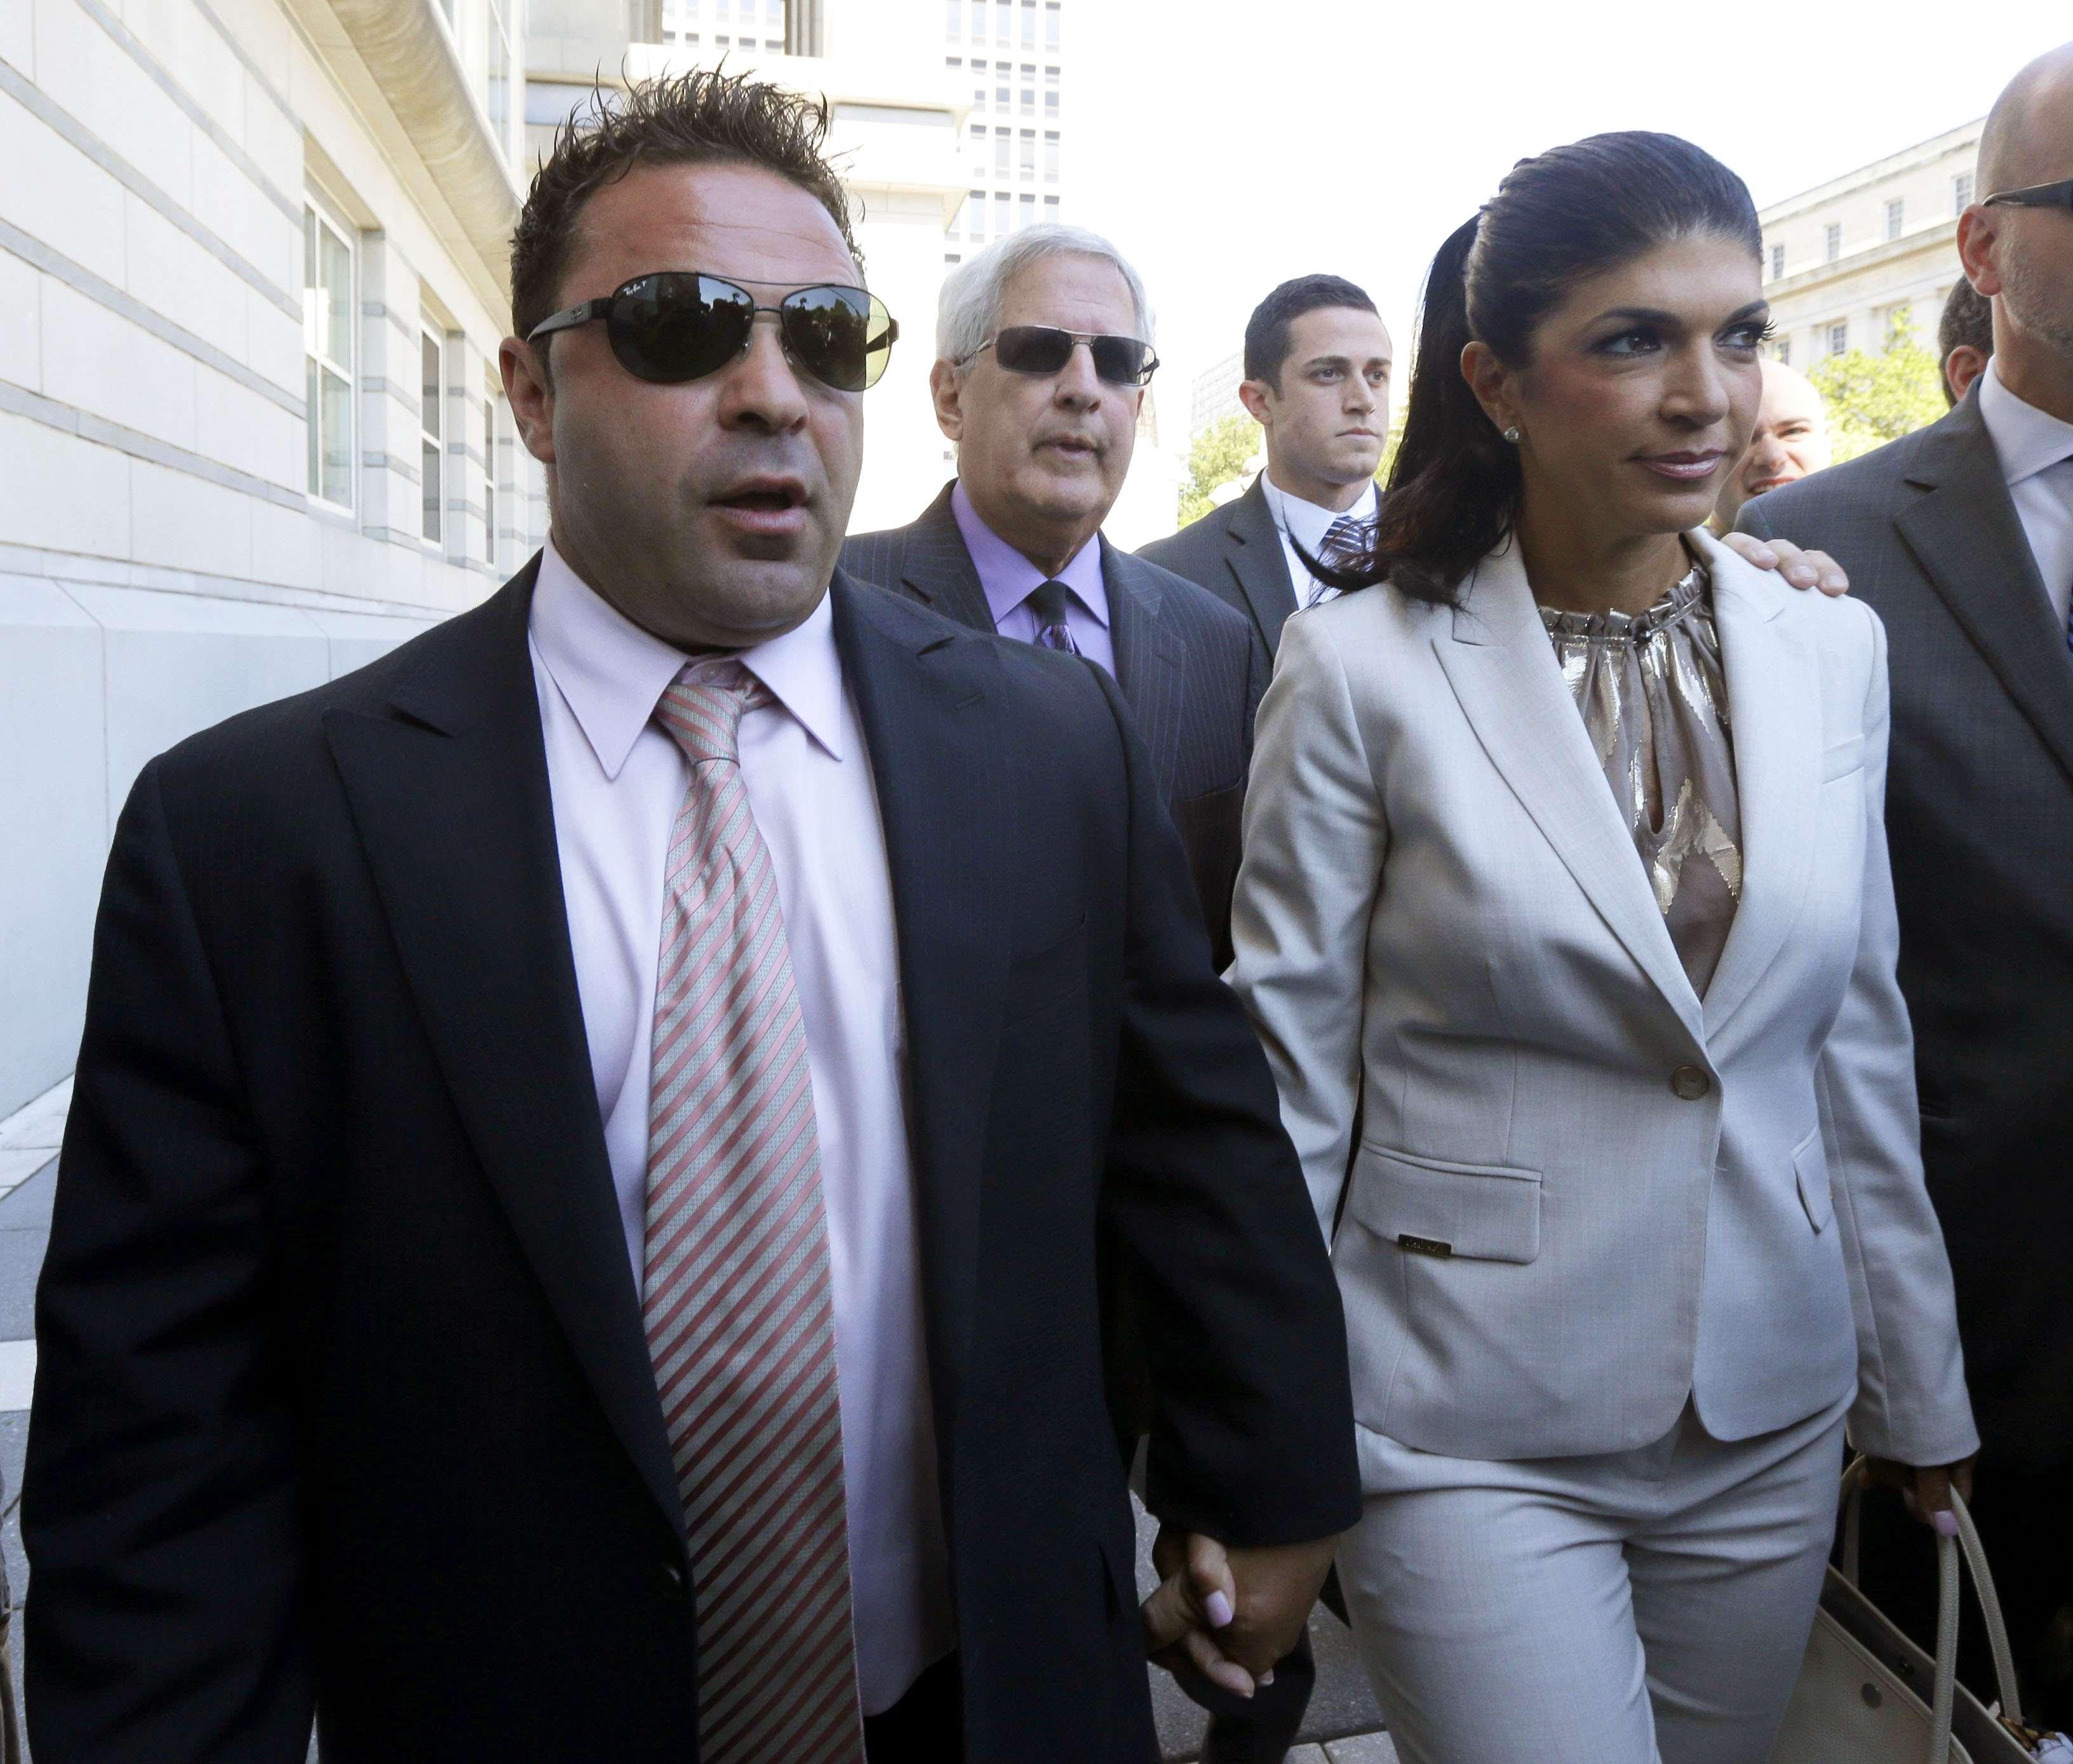 Teresa y Joe Giudice. Foto: AP en español